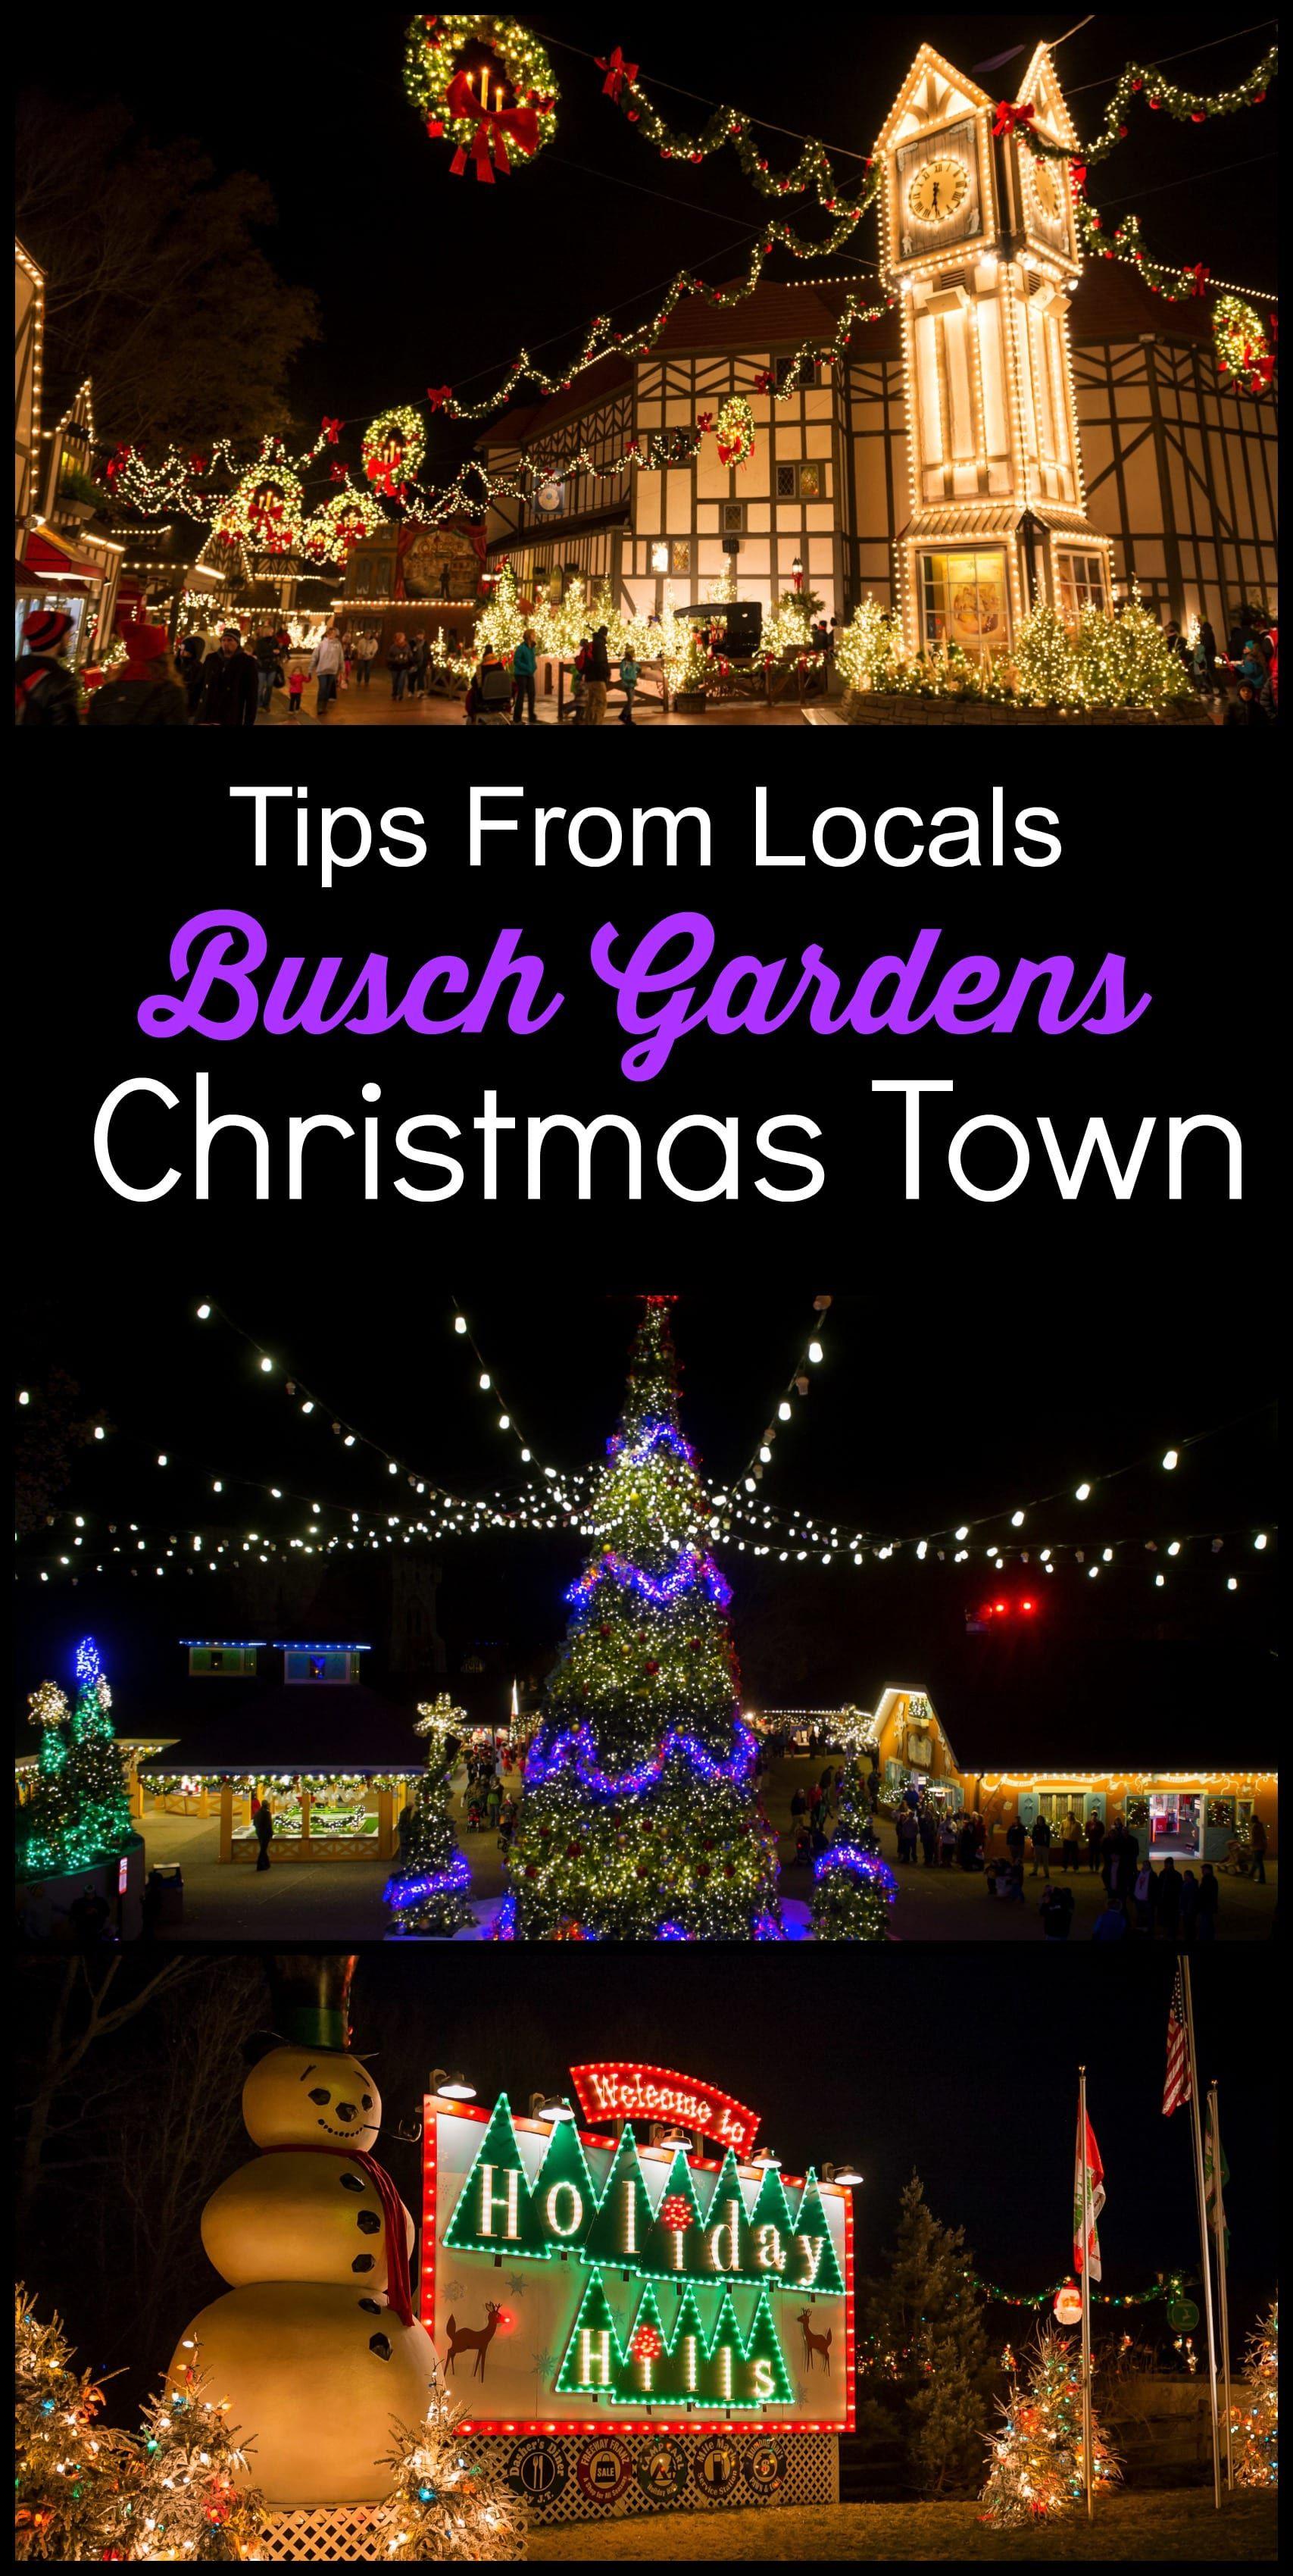 Busch Gardens Tampa Christmas Town 2020